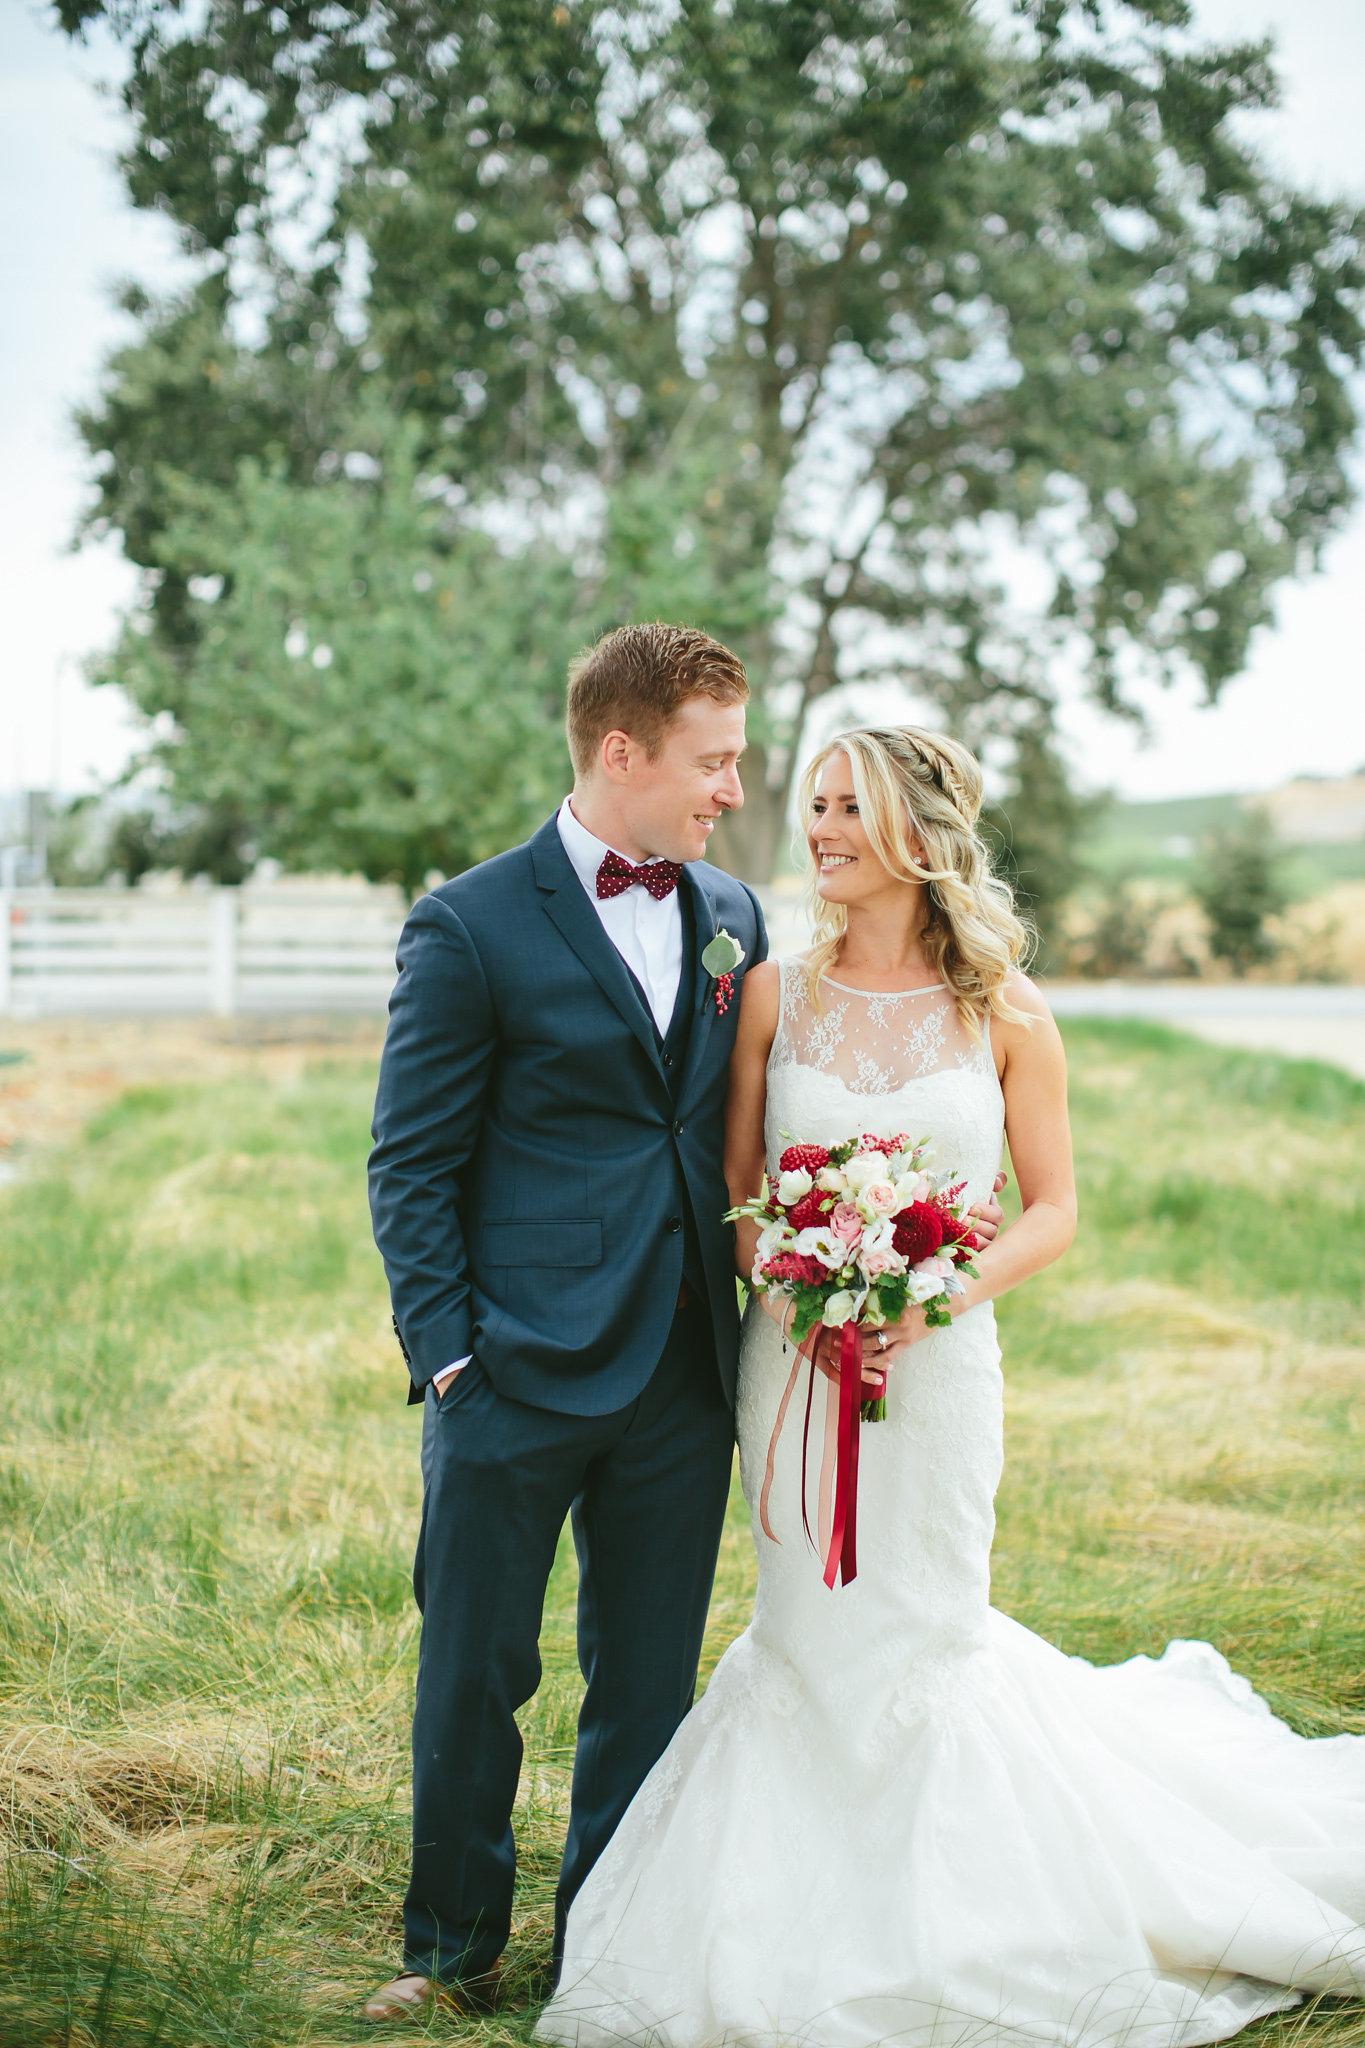 Kristen+Nick-WEDDING_WEB-154.jpg